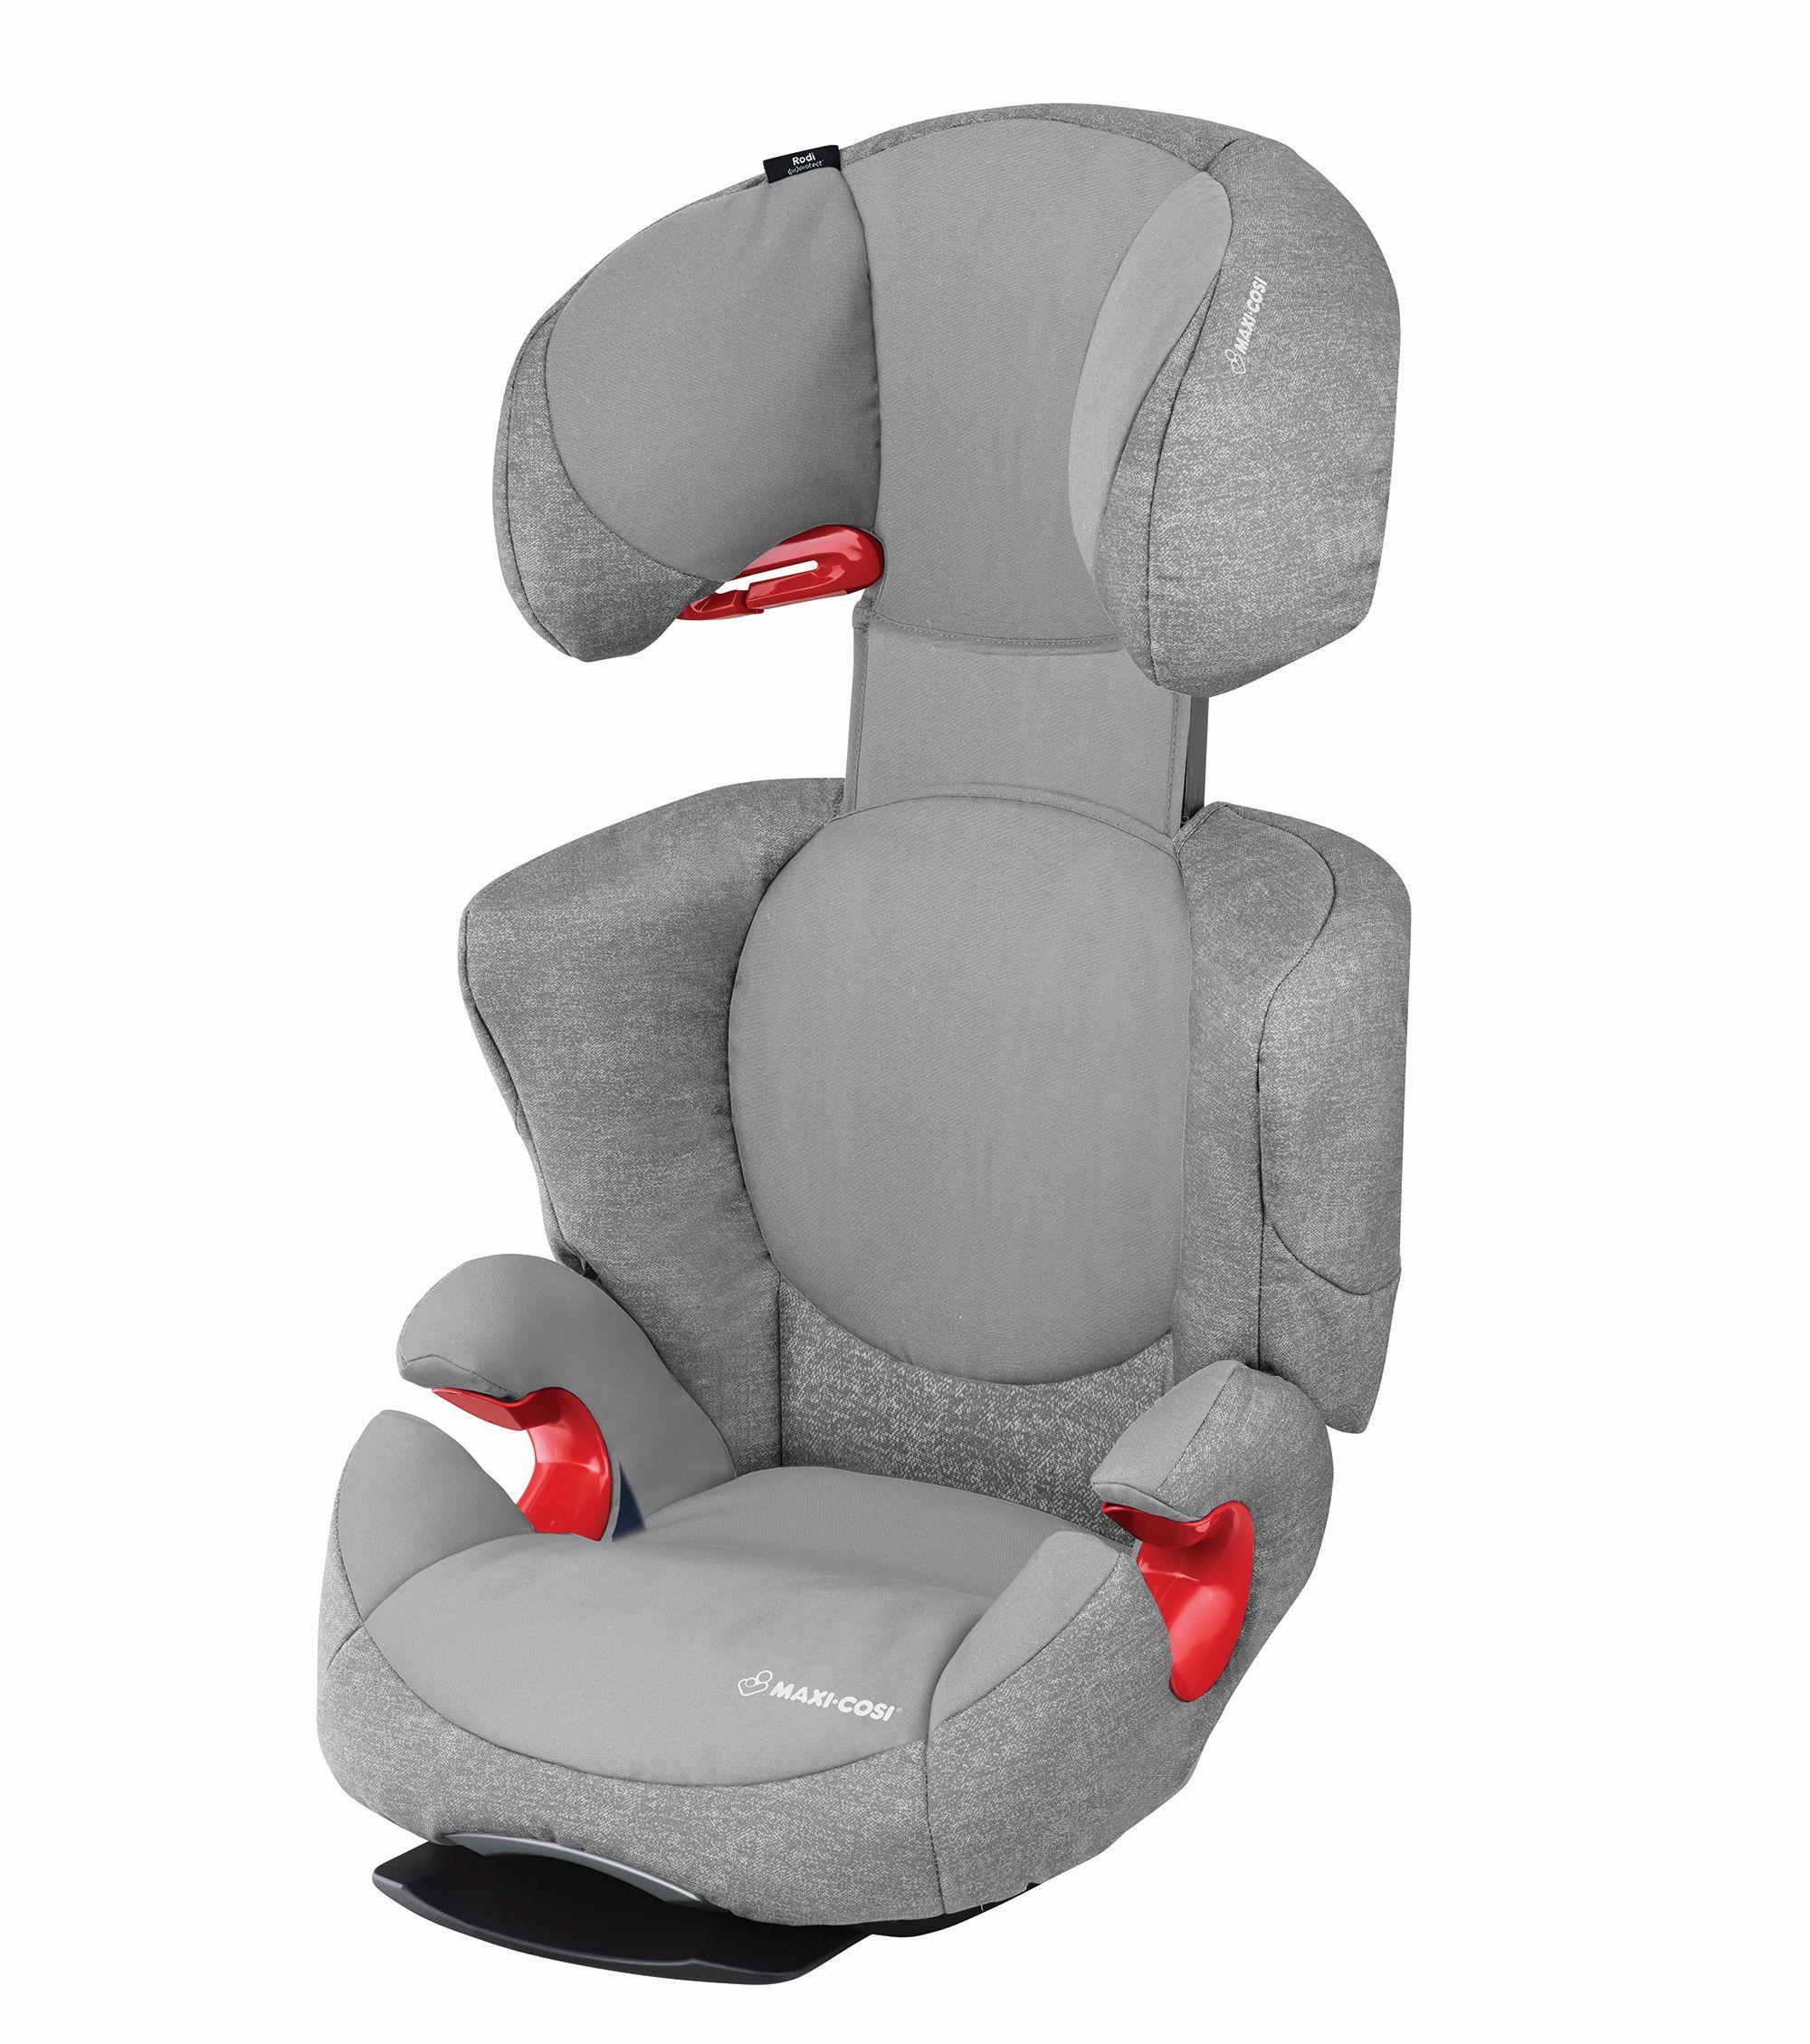 maxi cosi kindersitz rodi air protect 2019 nomad grey. Black Bedroom Furniture Sets. Home Design Ideas